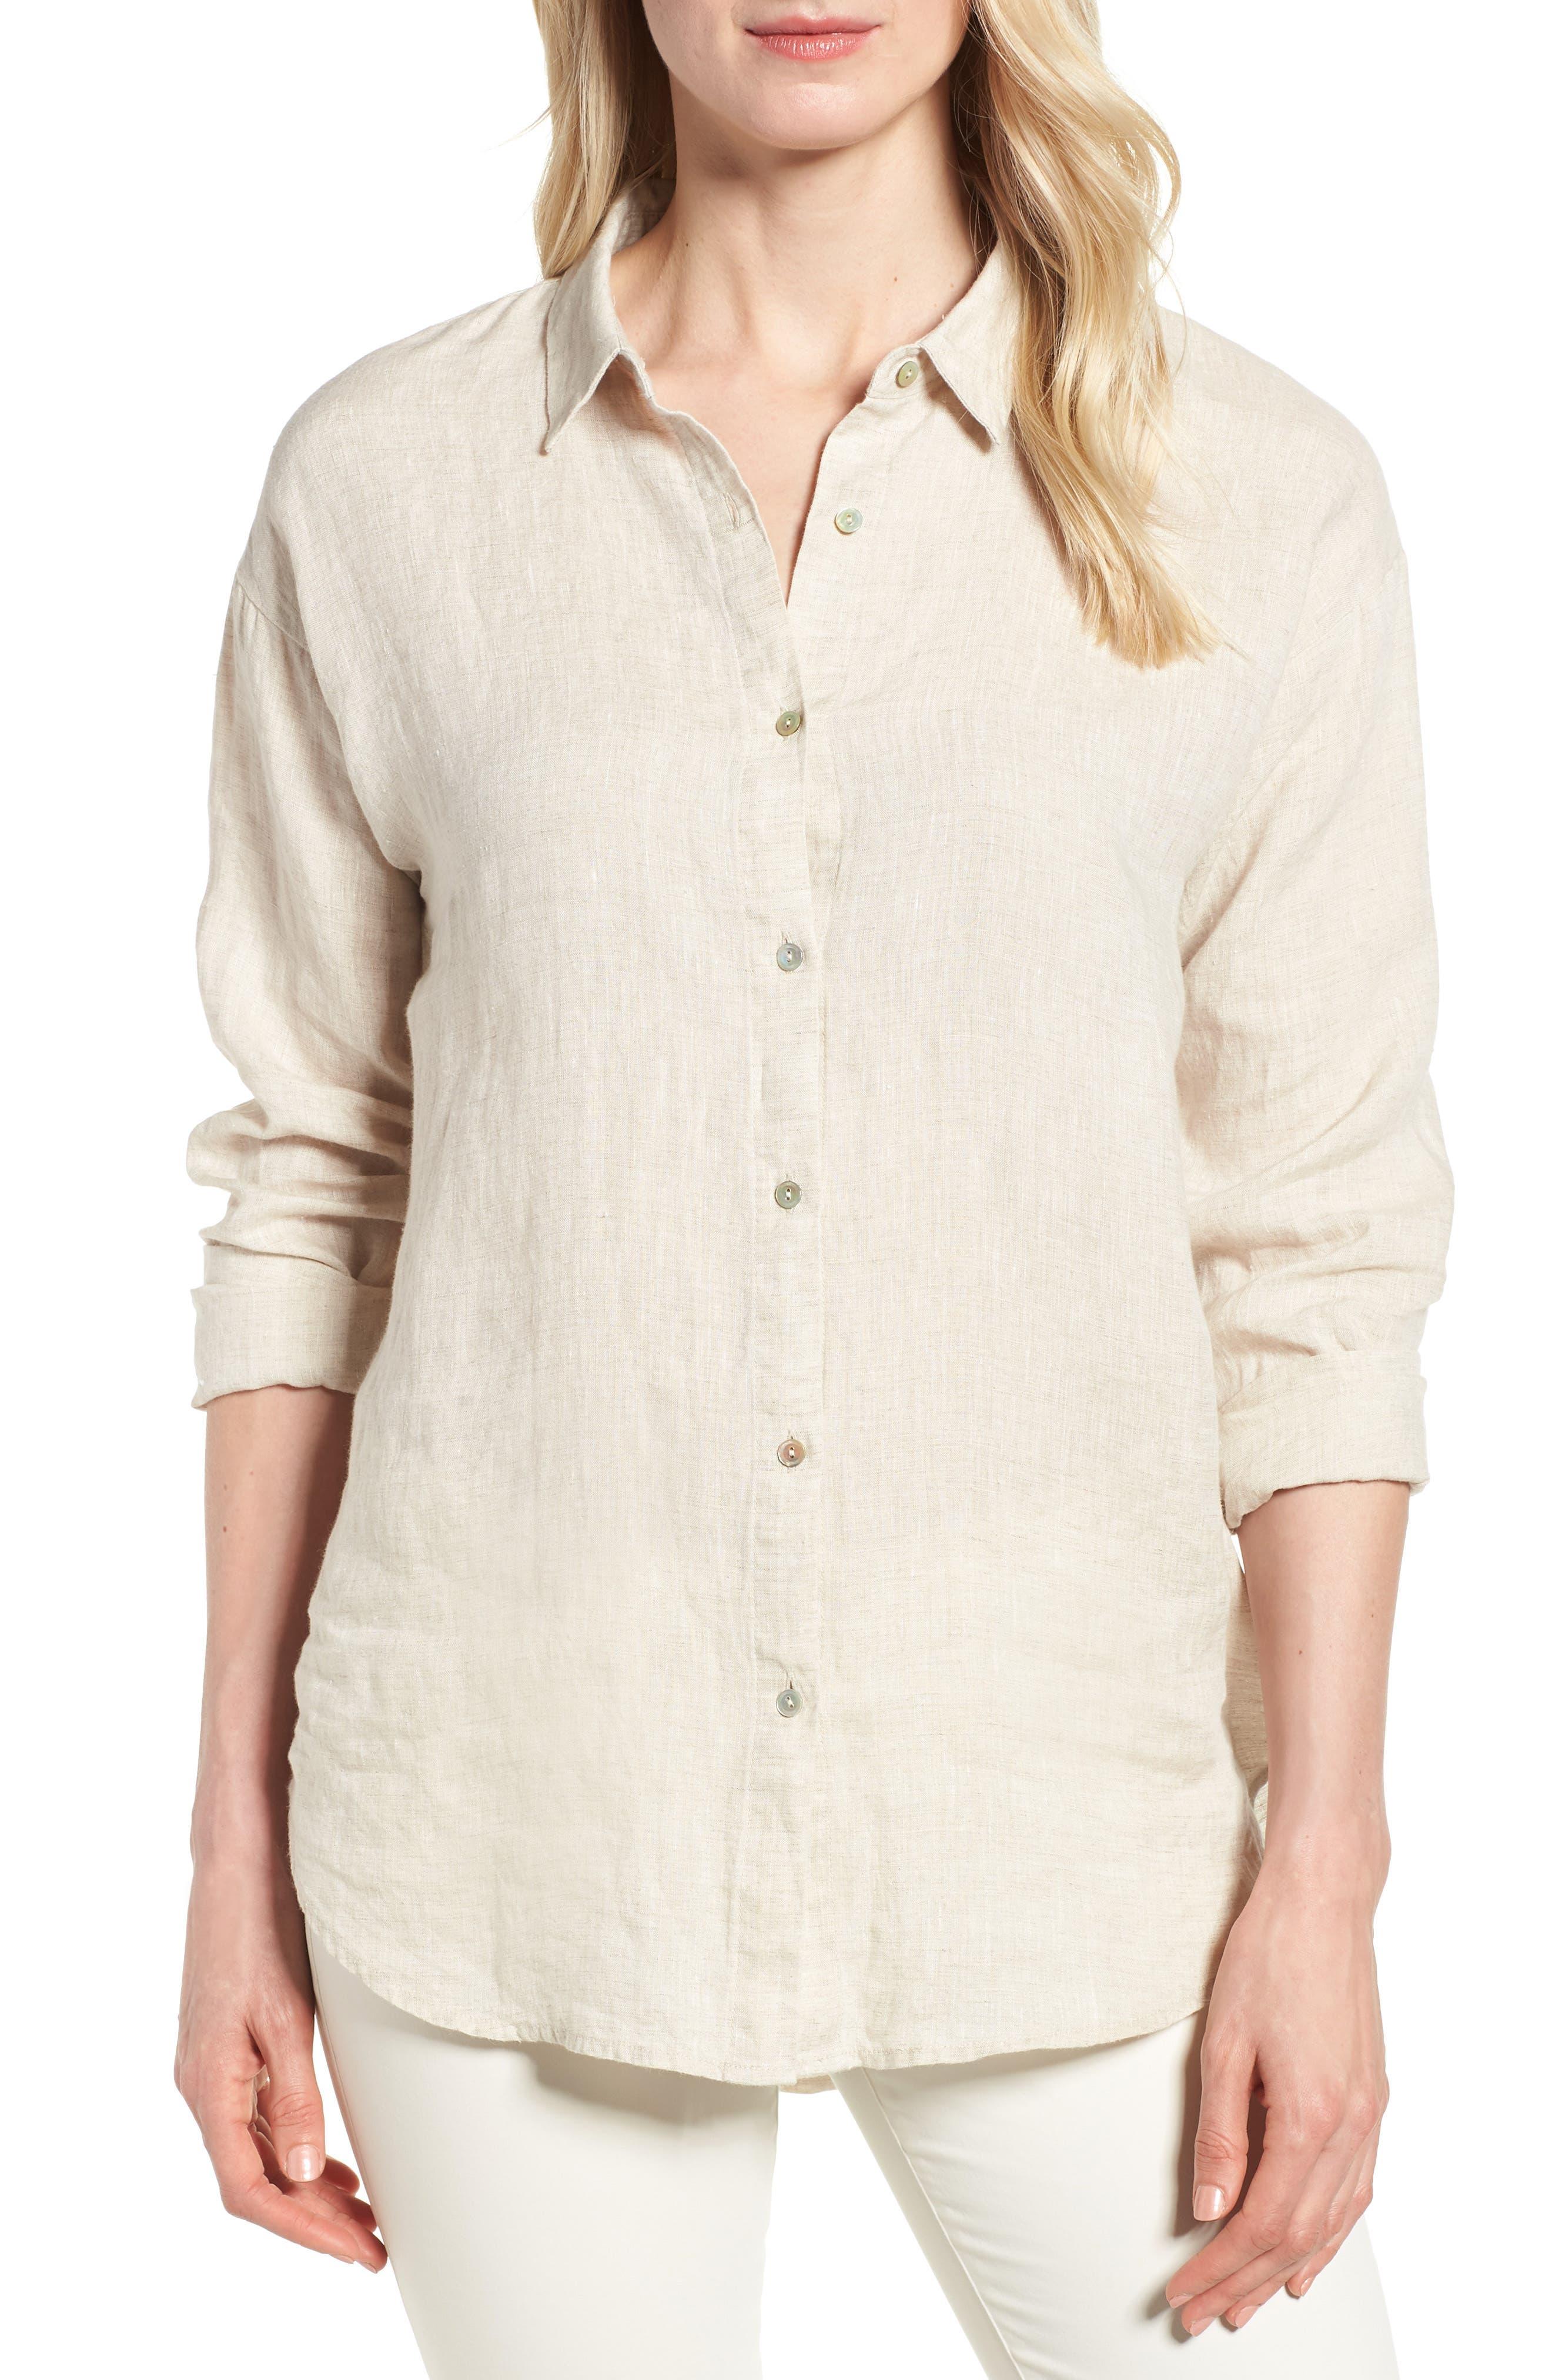 Organic Linen Shirt,                             Main thumbnail 1, color,                             257